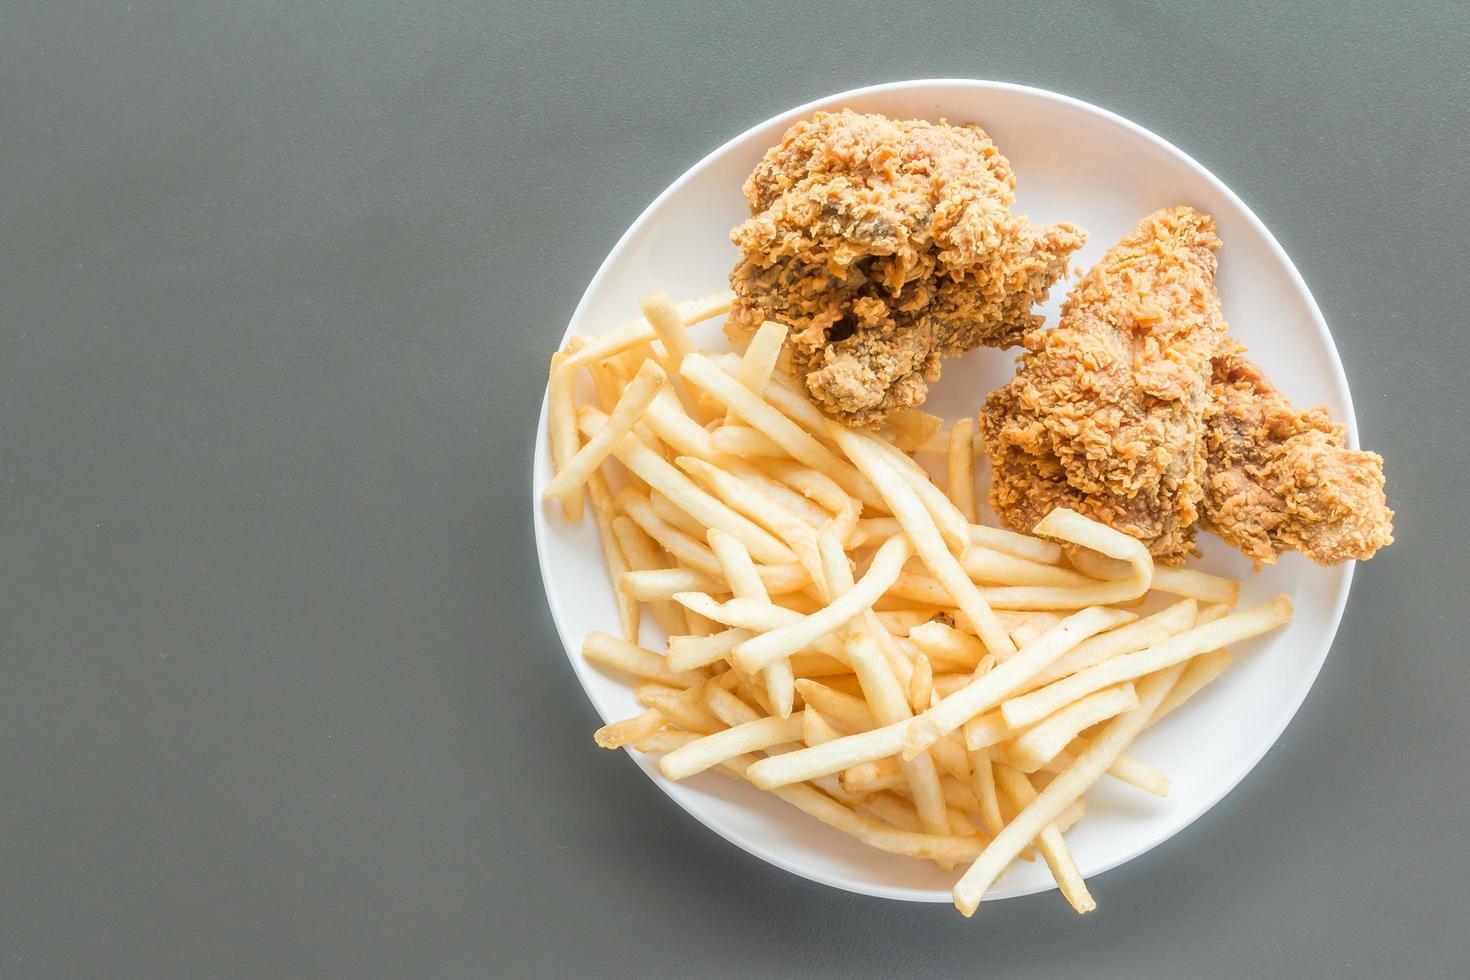 pommes frites och stekt kyckling foto